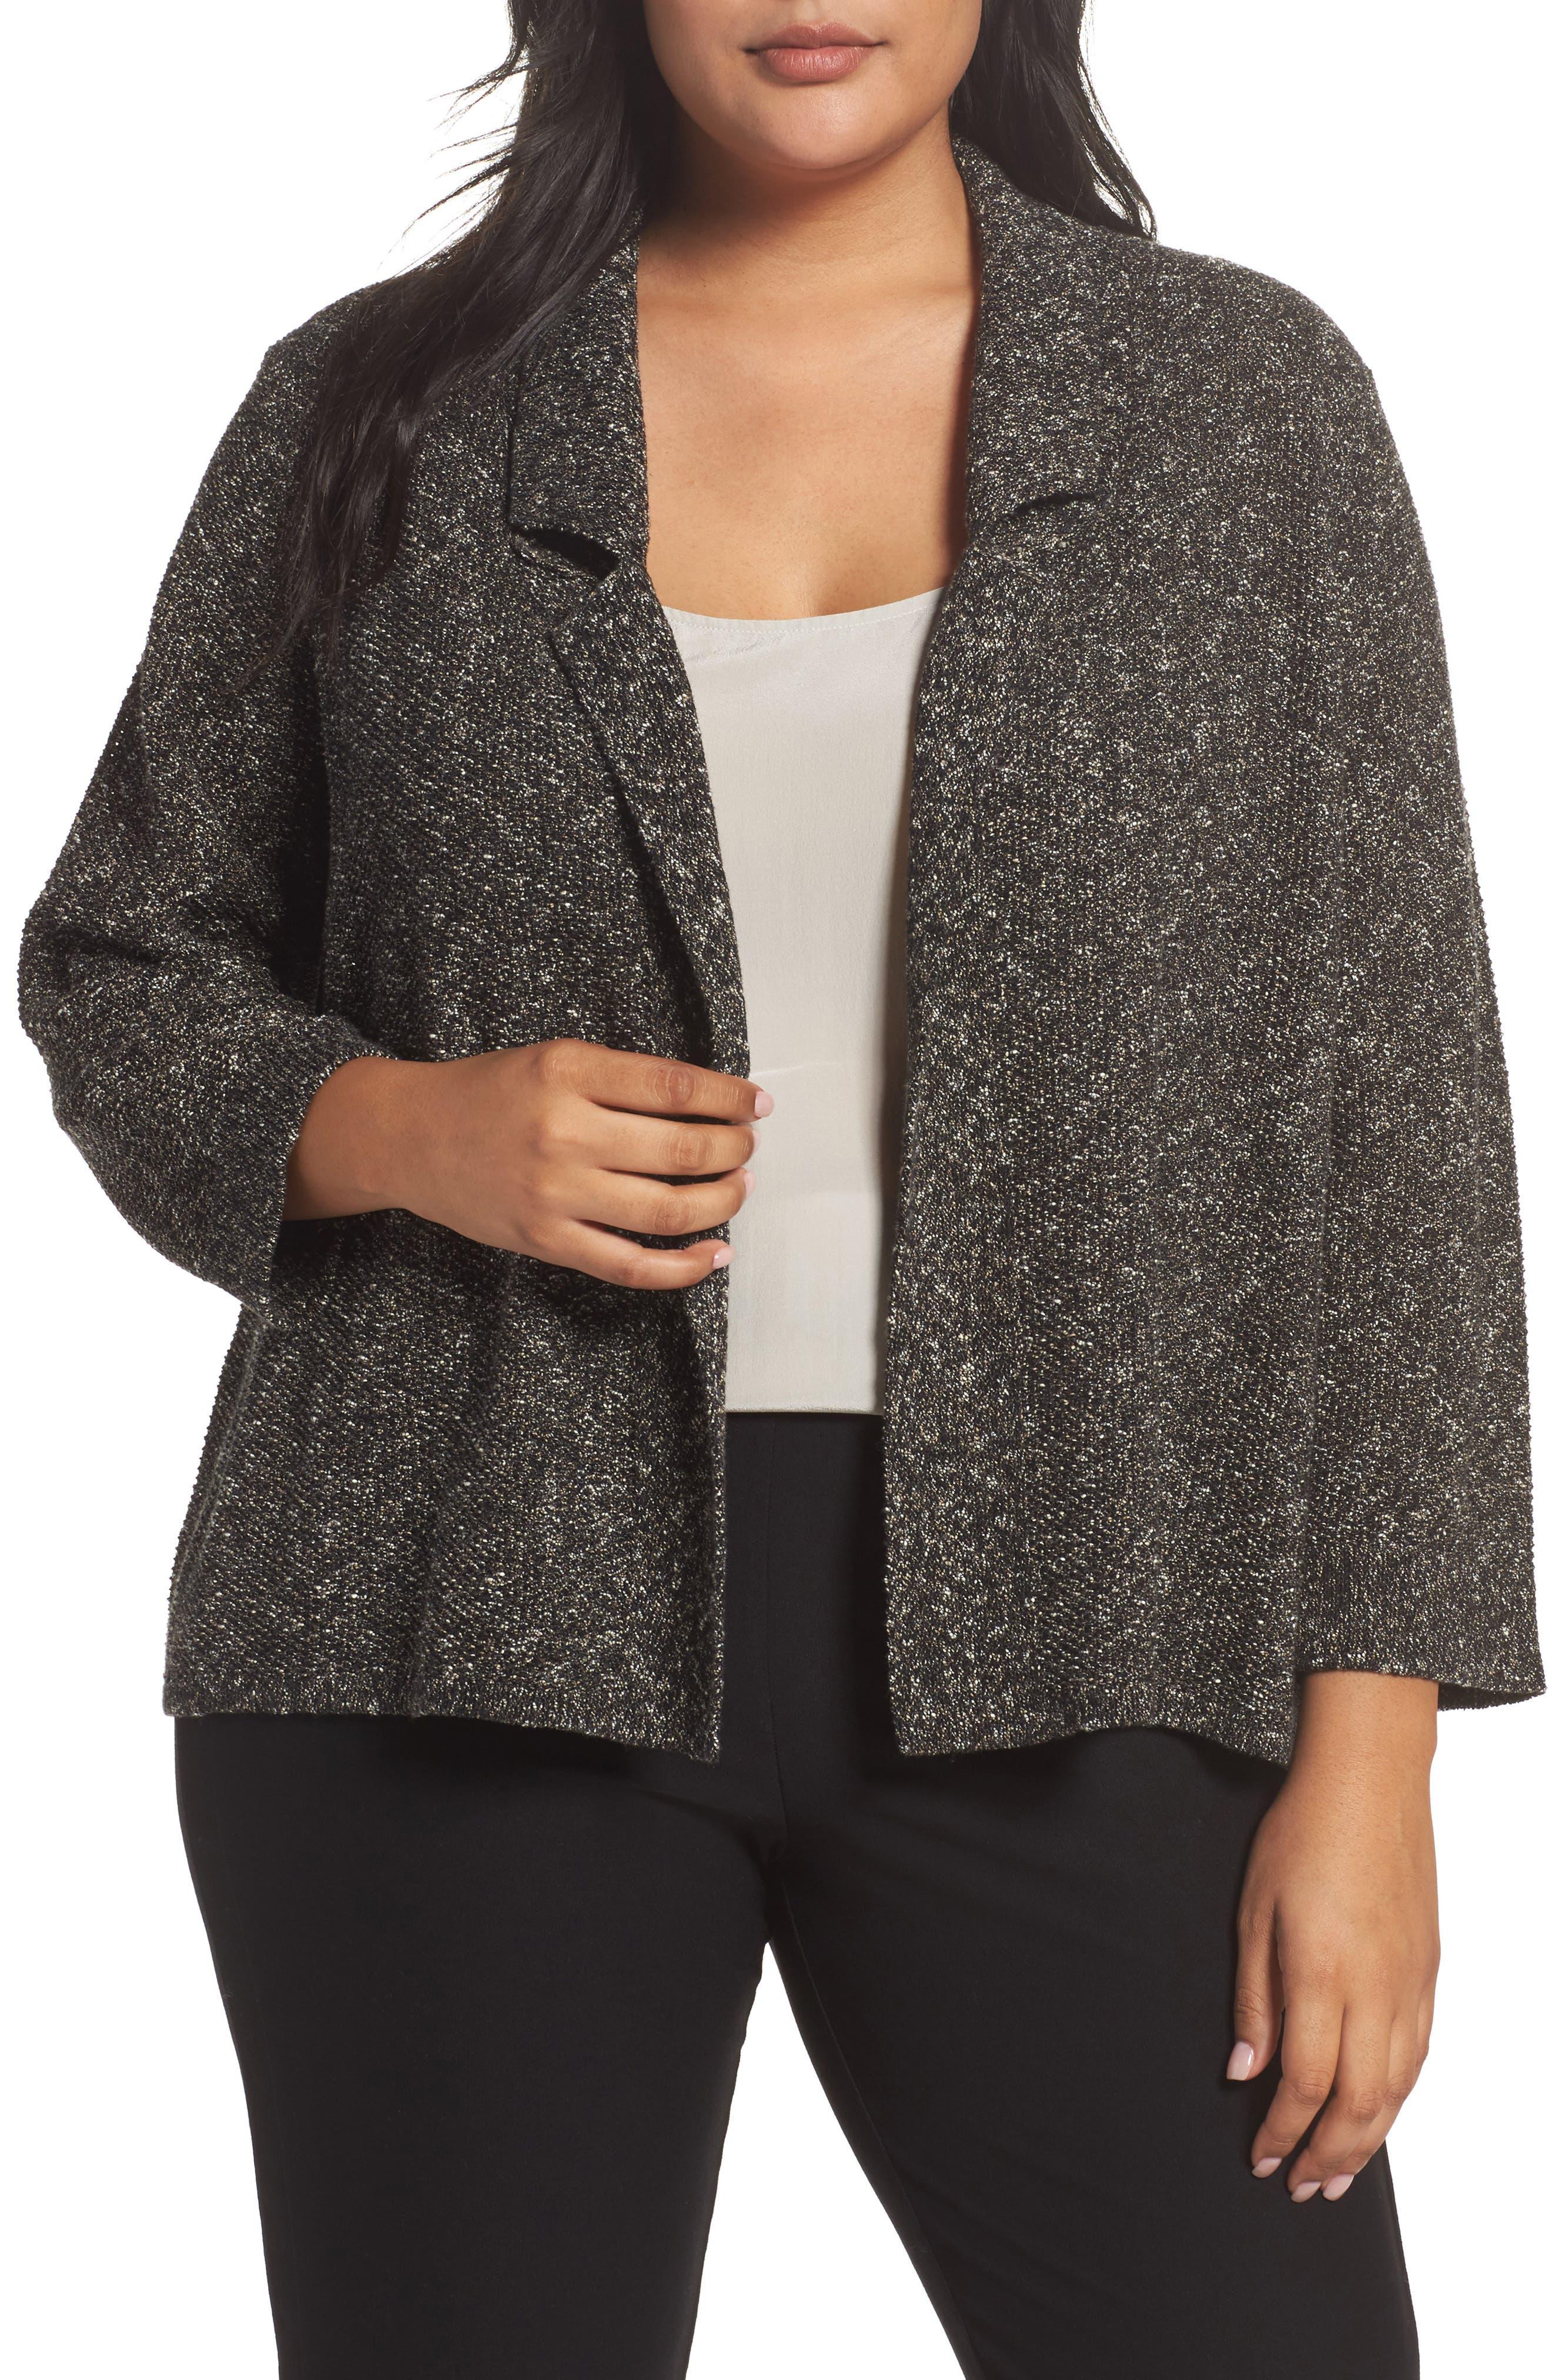 Organic Cotton Blend Sweater Jacket,                         Main,                         color, Black